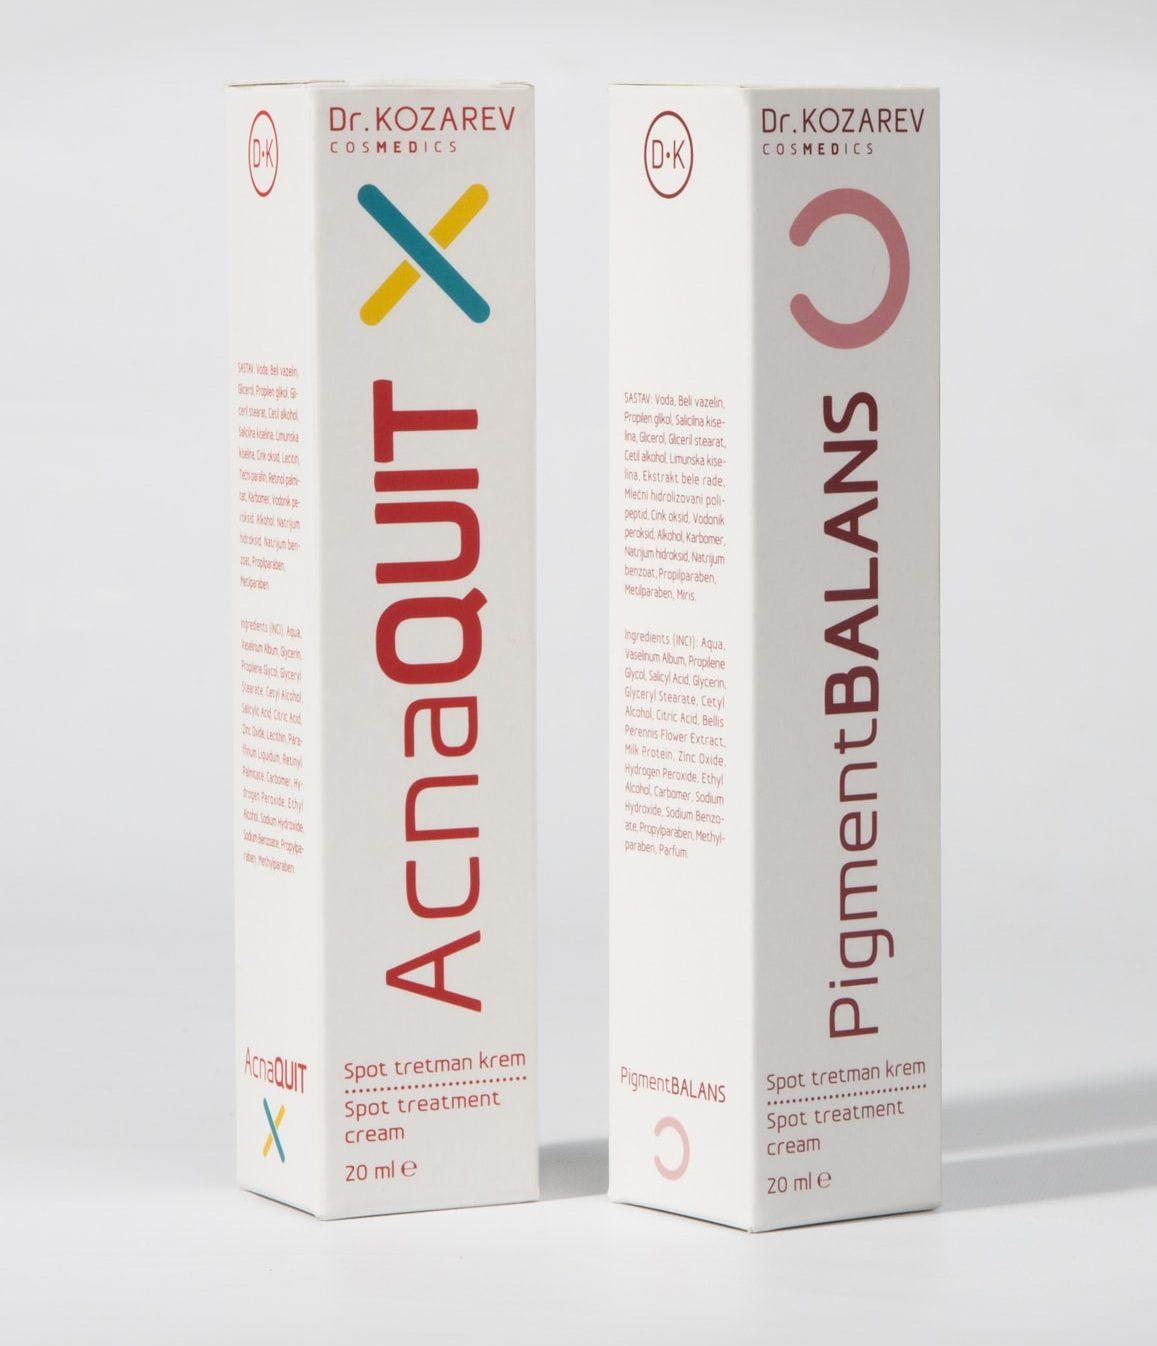 DrKozarev_Cosmetics_Shonski_packaging_MedBeautyLine_AcnaQuit_PigmentBalans